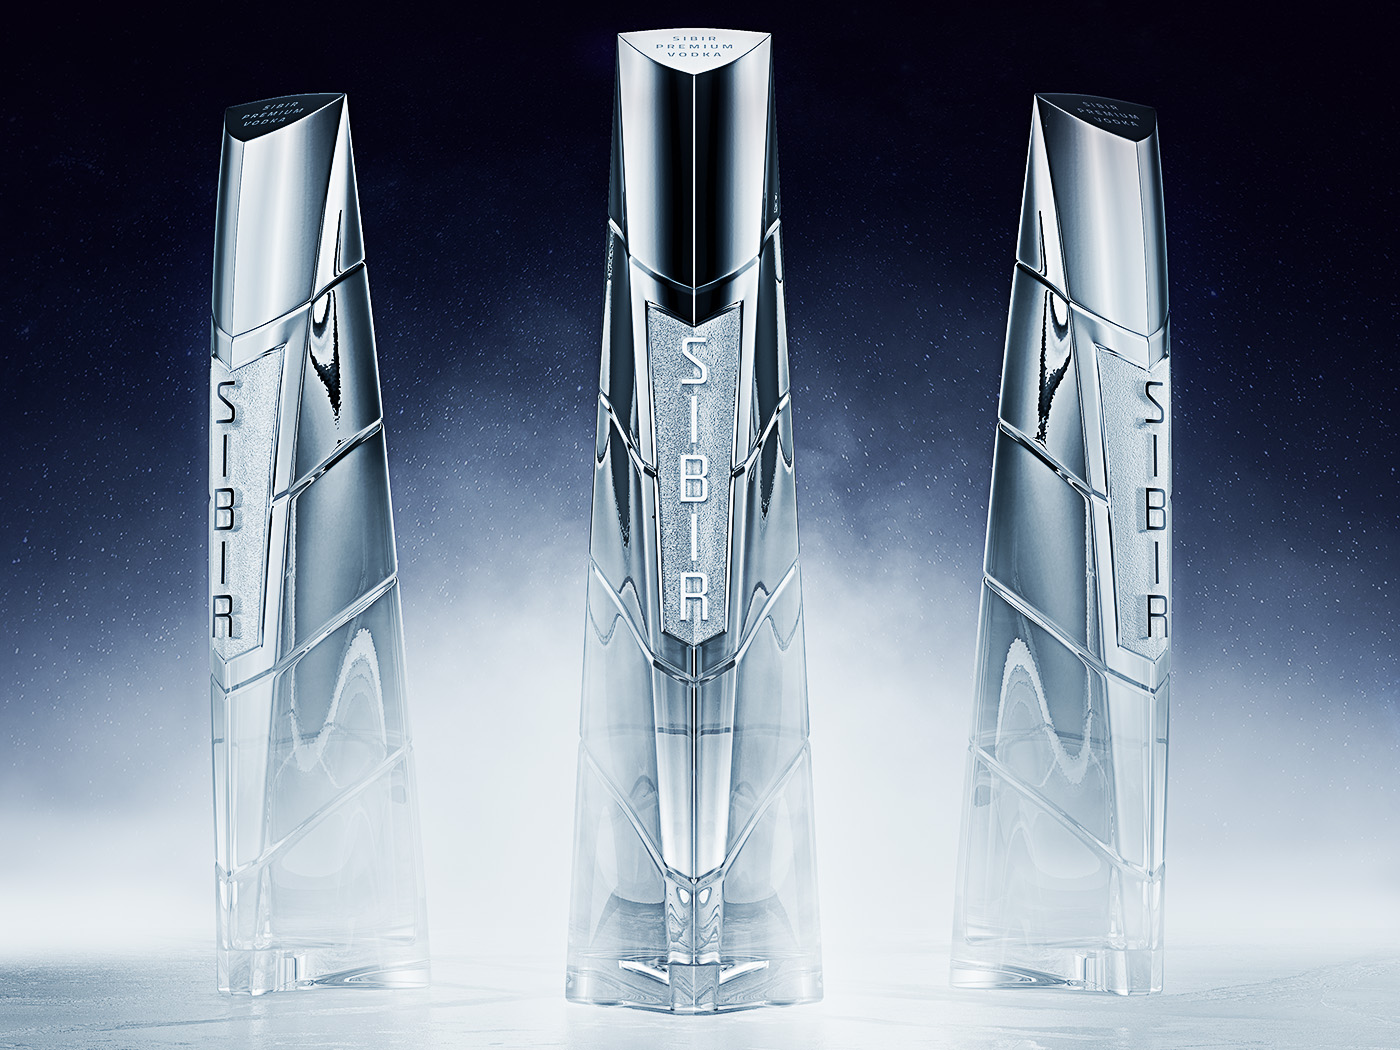 Sibir ultra premium luxury vodka 1.jpg